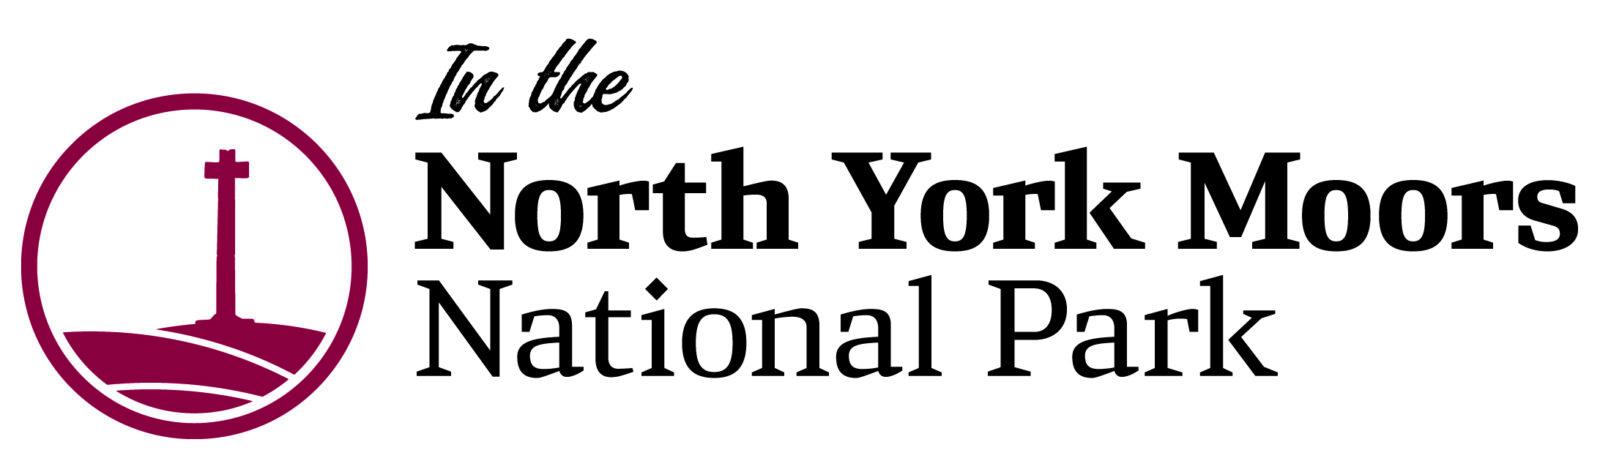 North York Moors National Park logo.